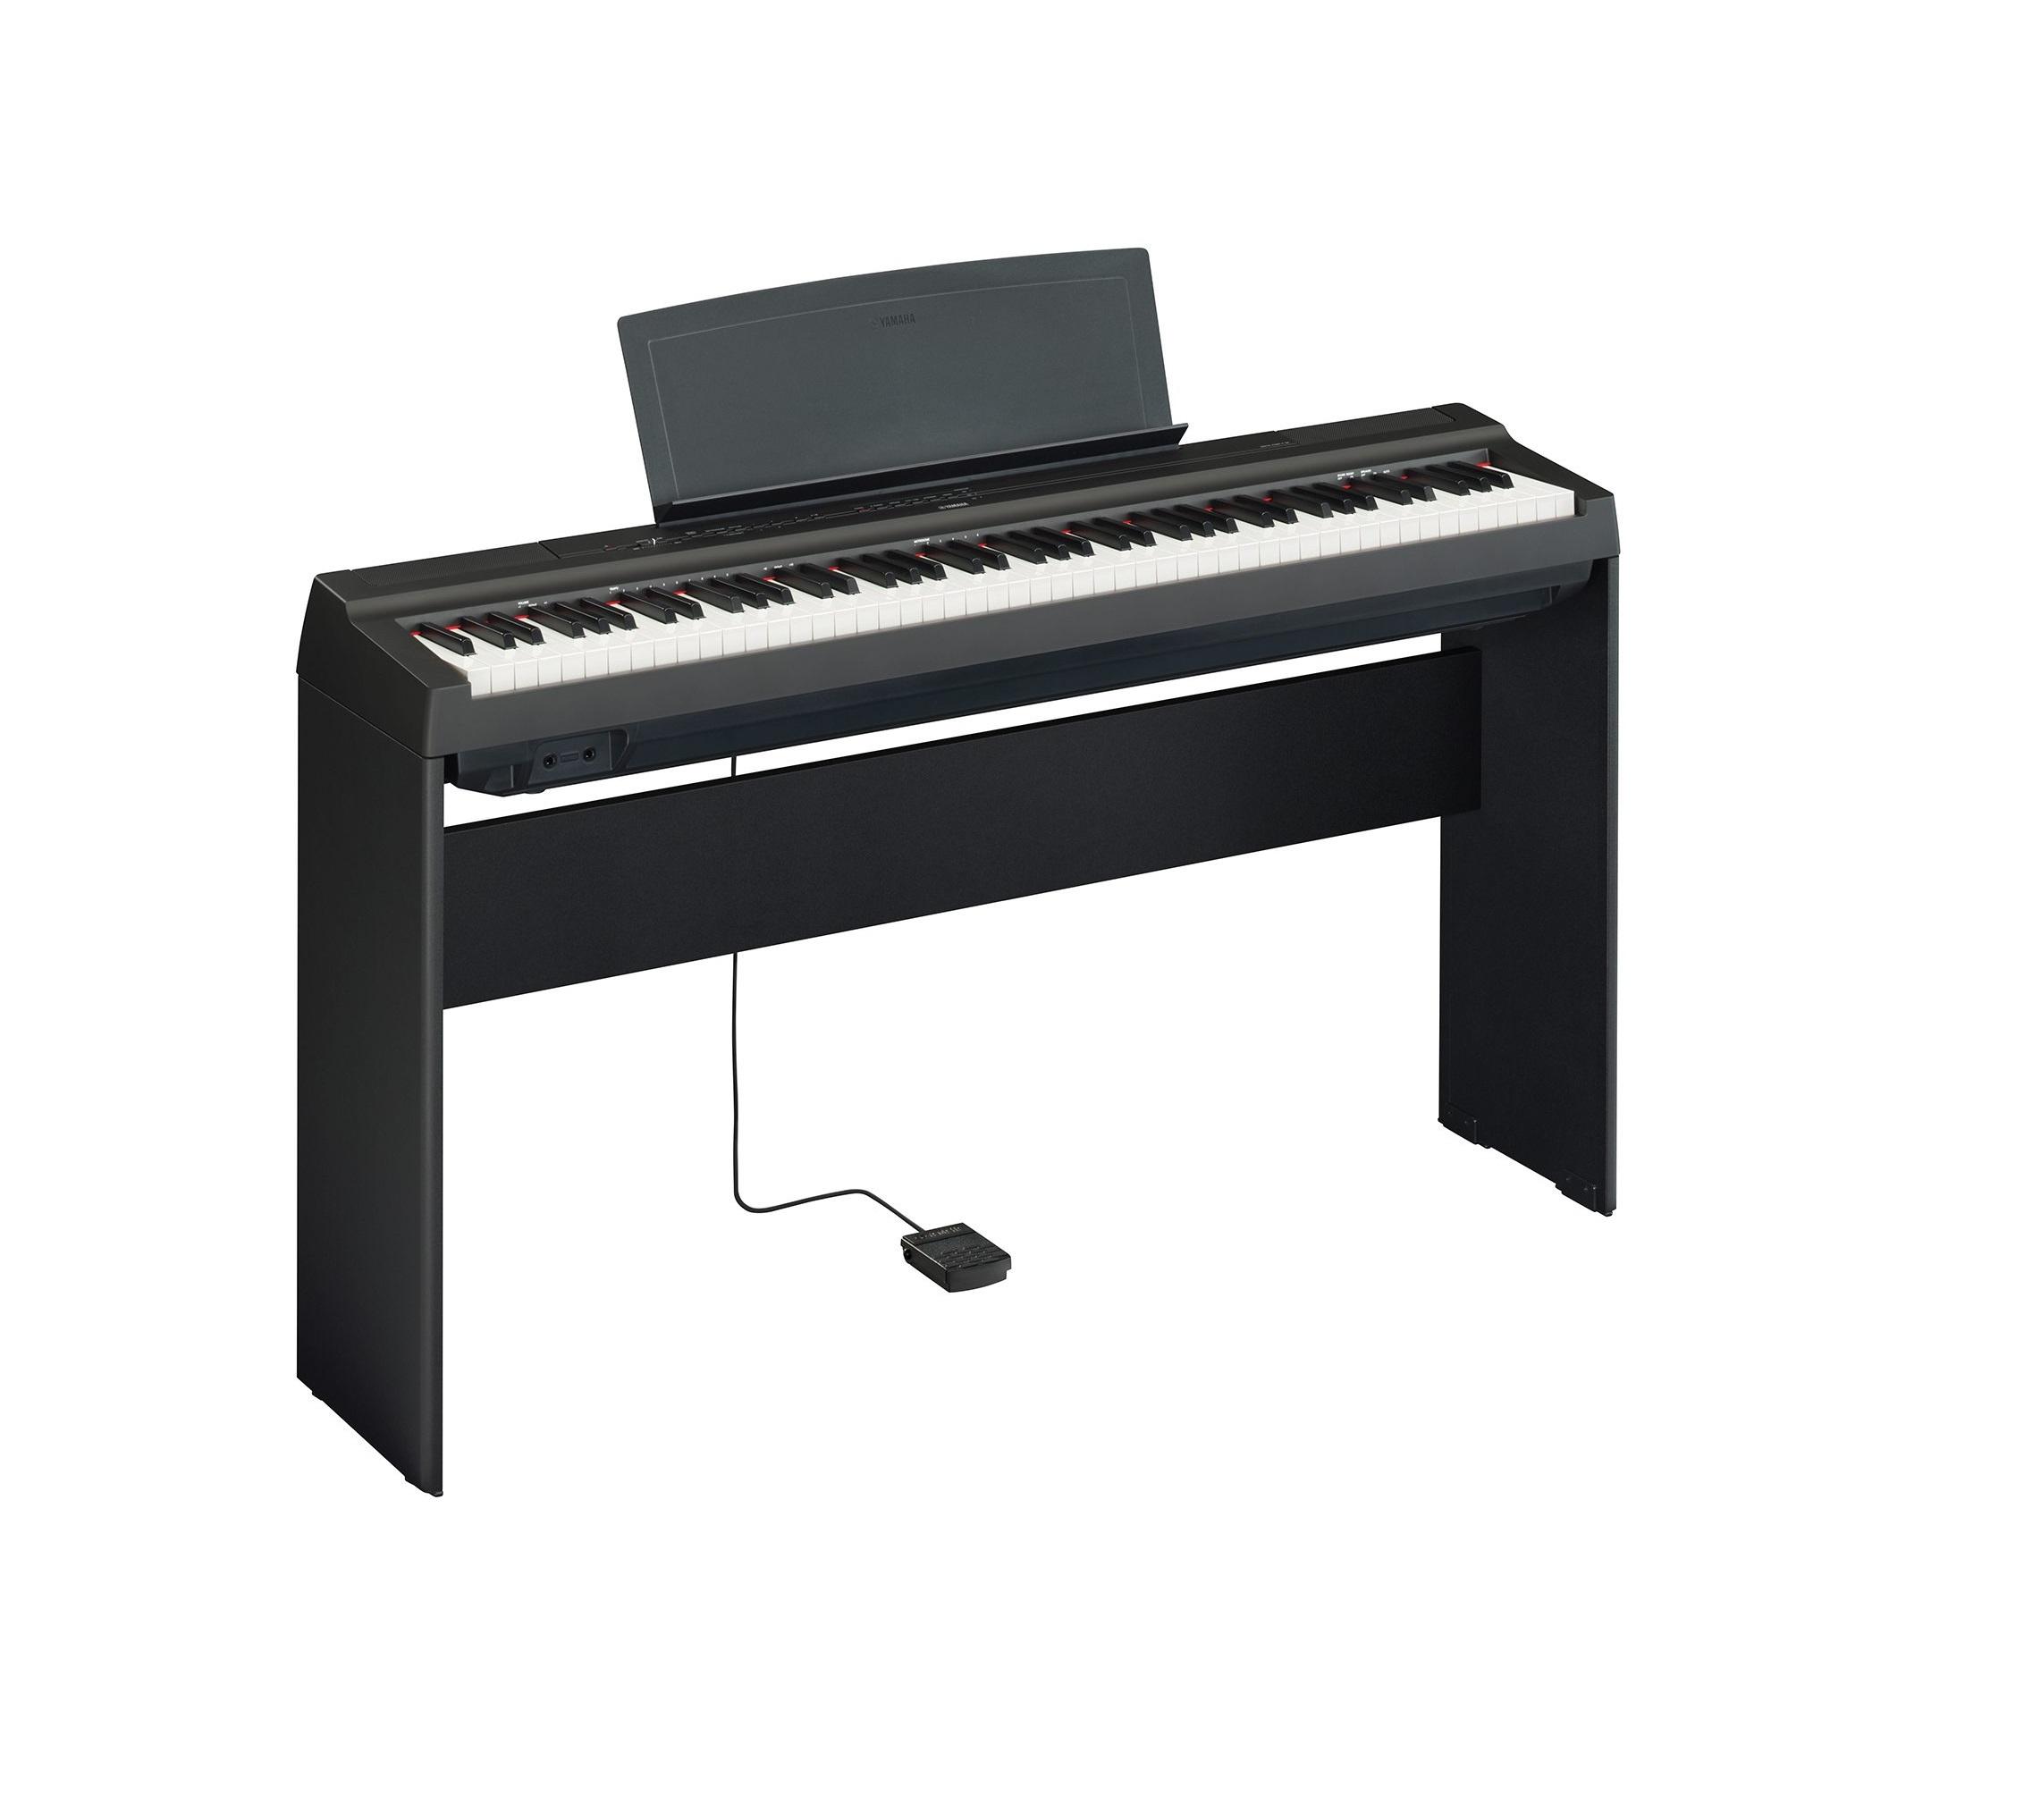 Yamaha P 125 Digitalt Piano, Svart med L 125B stativ GP Musikk